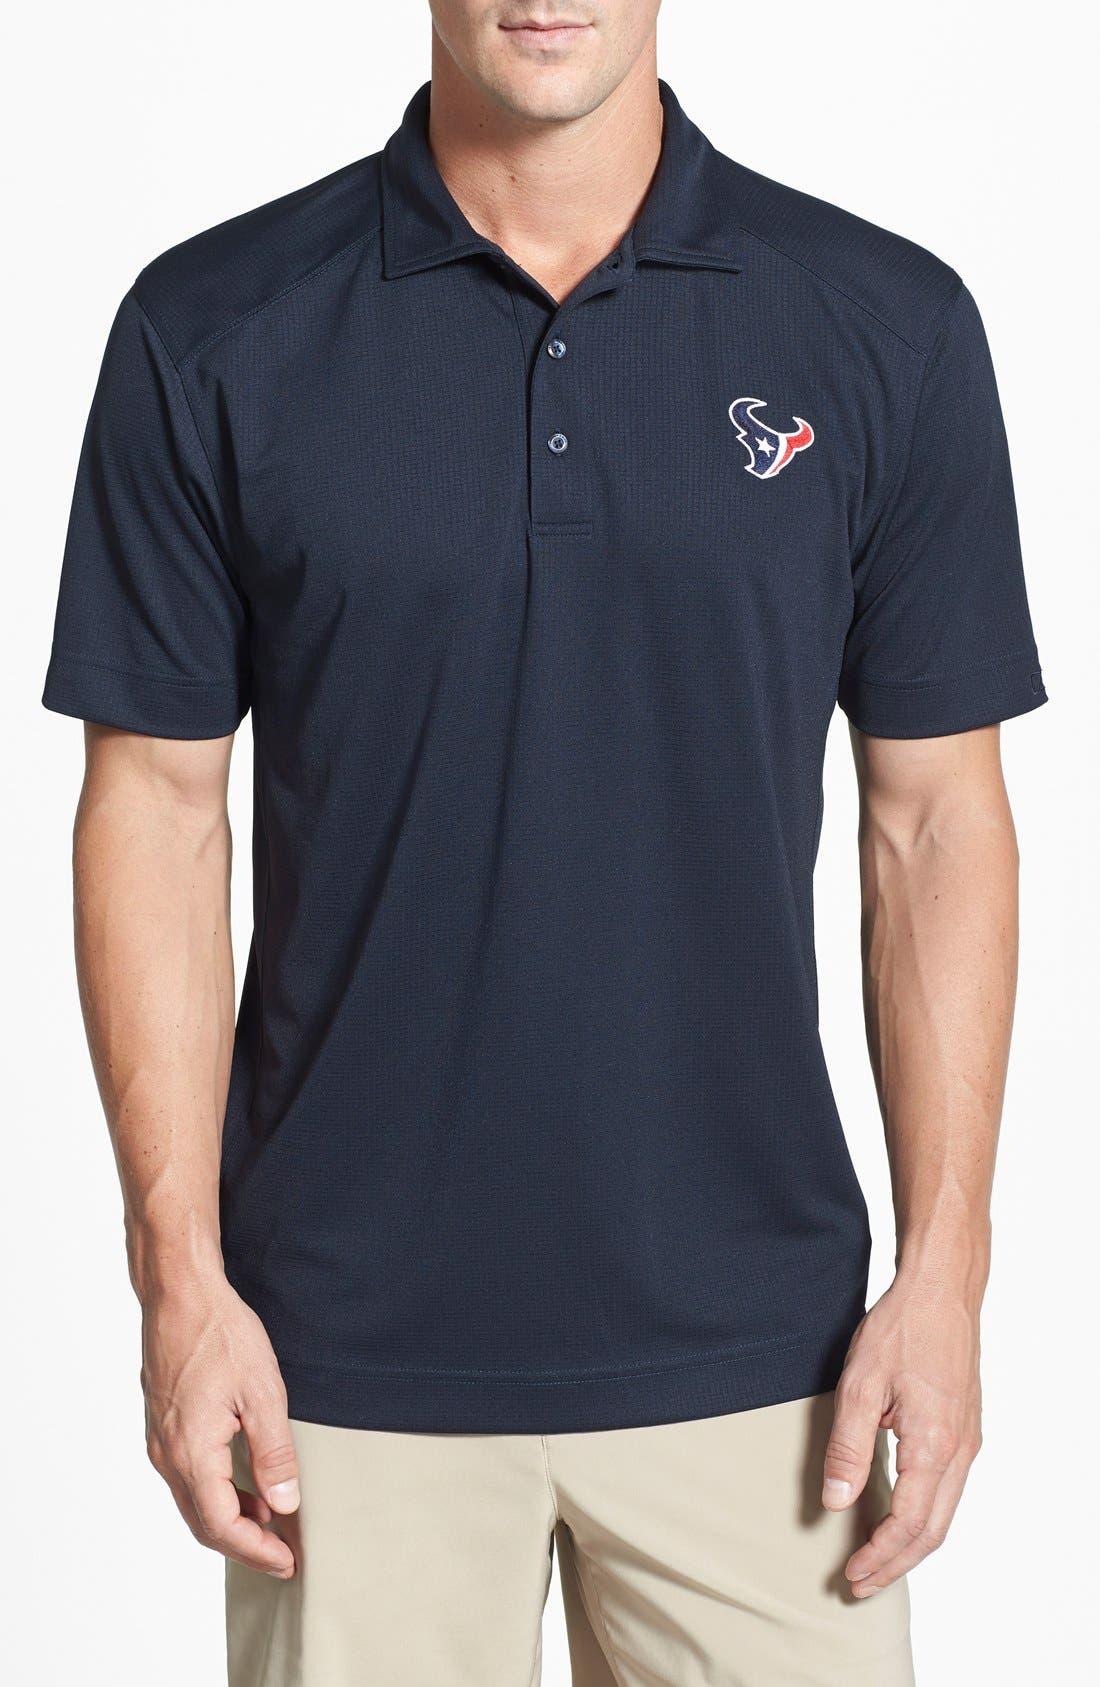 Houston Texans - Genre DryTec Moisture Wicking Polo,                         Main,                         color, 420